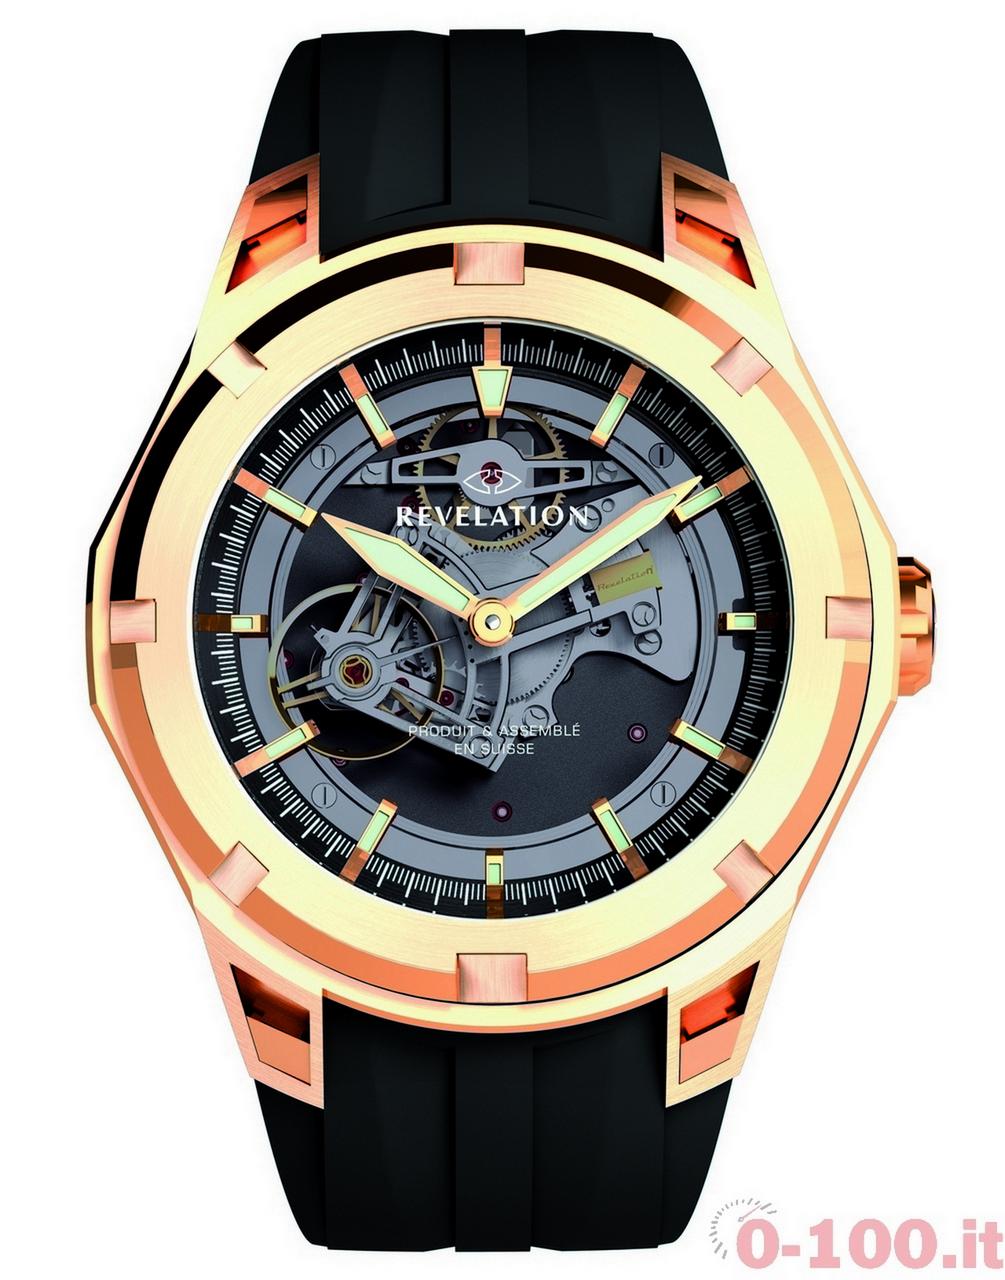 anteprima-baselworld-2014-revelation-r04-tourbillon-magical-watch-dial_0-1004